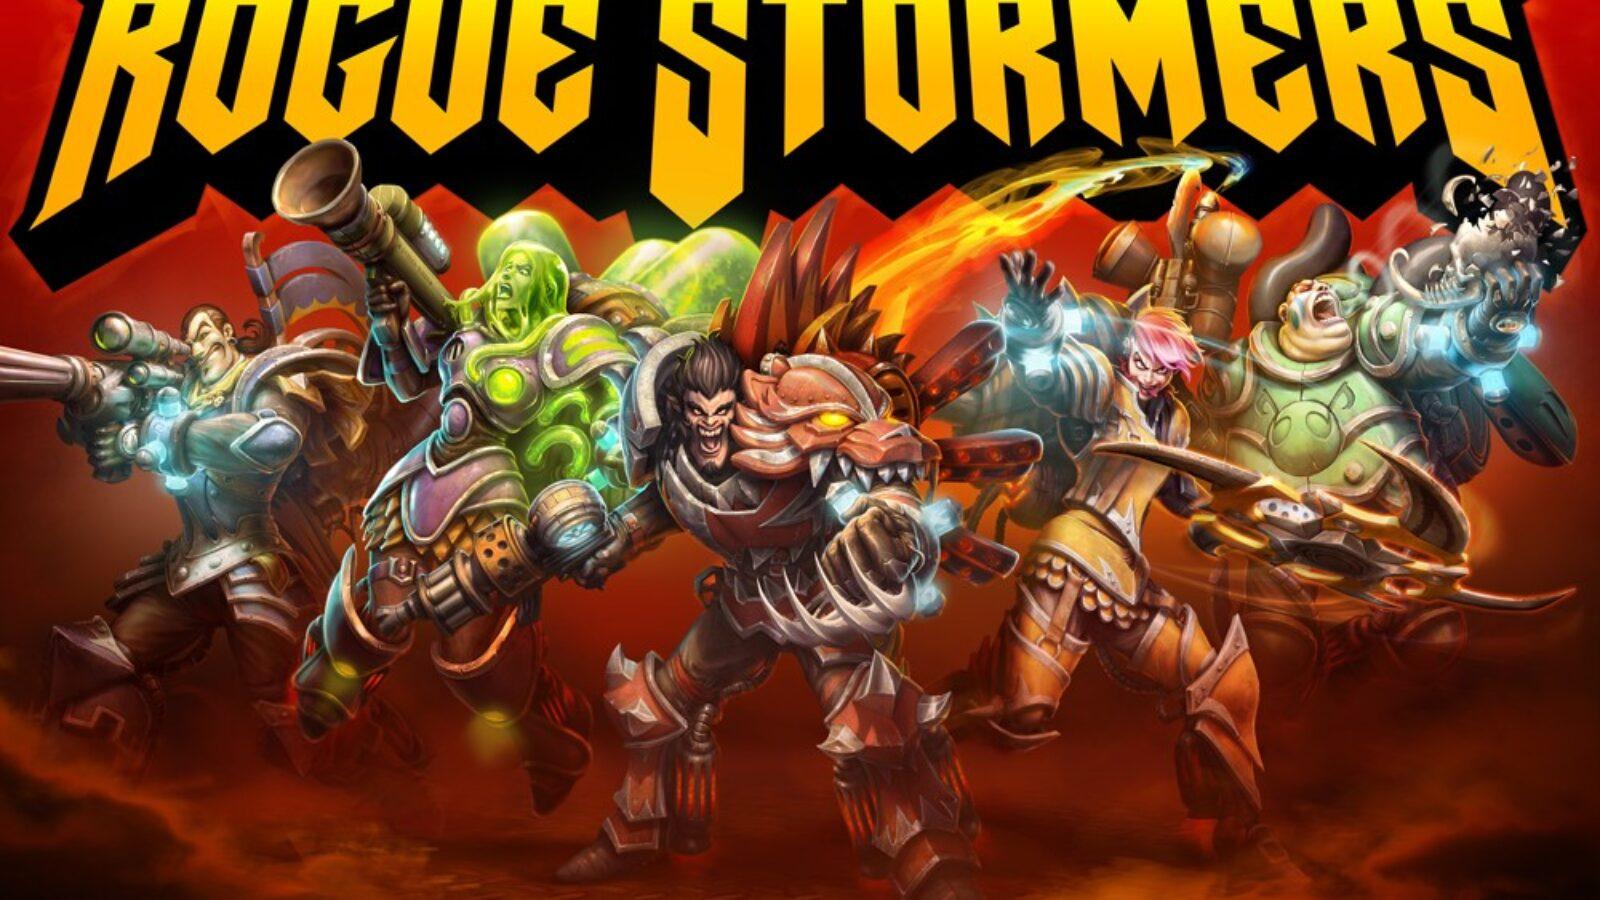 RogueStormers_Characters